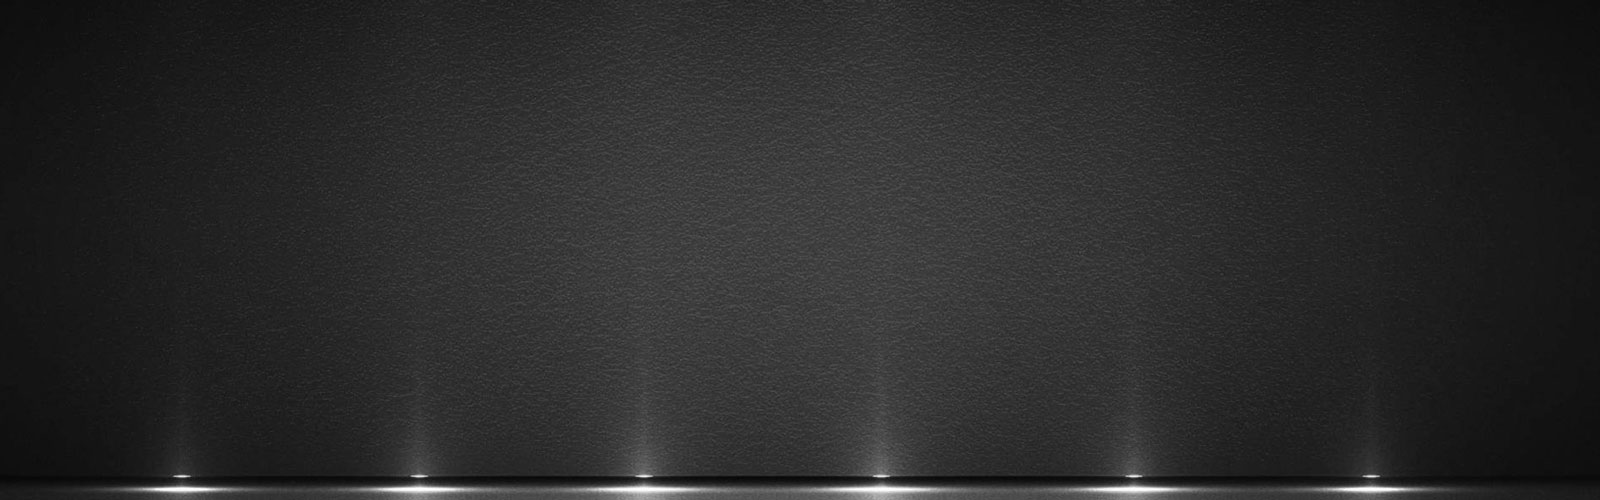 lights-funeral